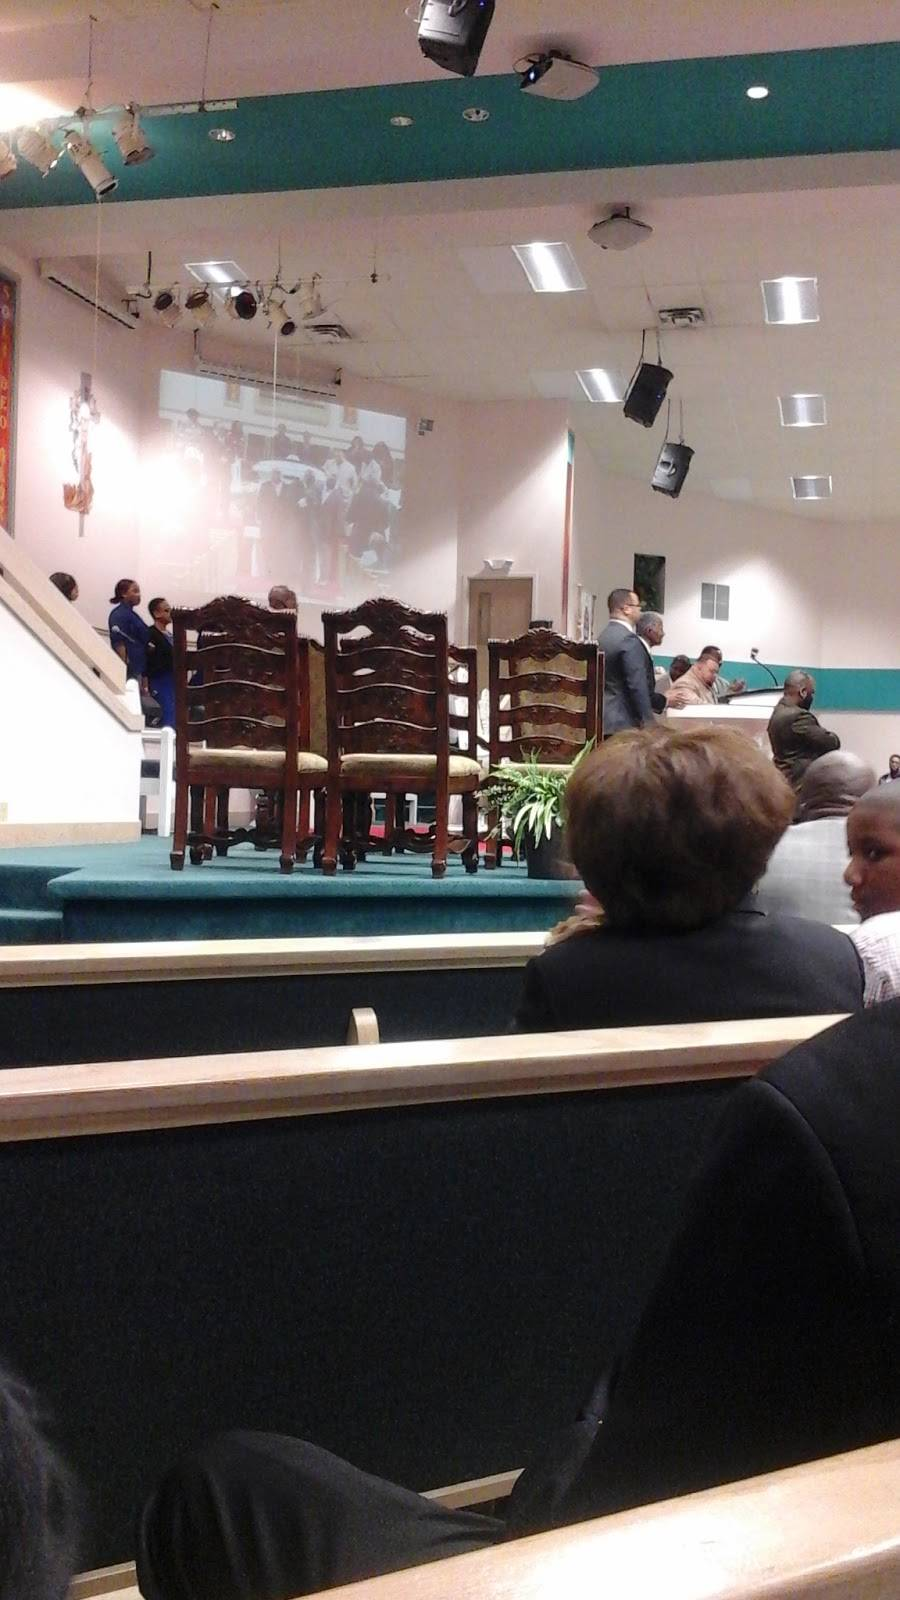 Mount Hermon Missionary Baptist Church - church  | Photo 2 of 9 | Address: 2283 Sunbury Rd, Columbus, OH 43219, USA | Phone: (614) 471-1133